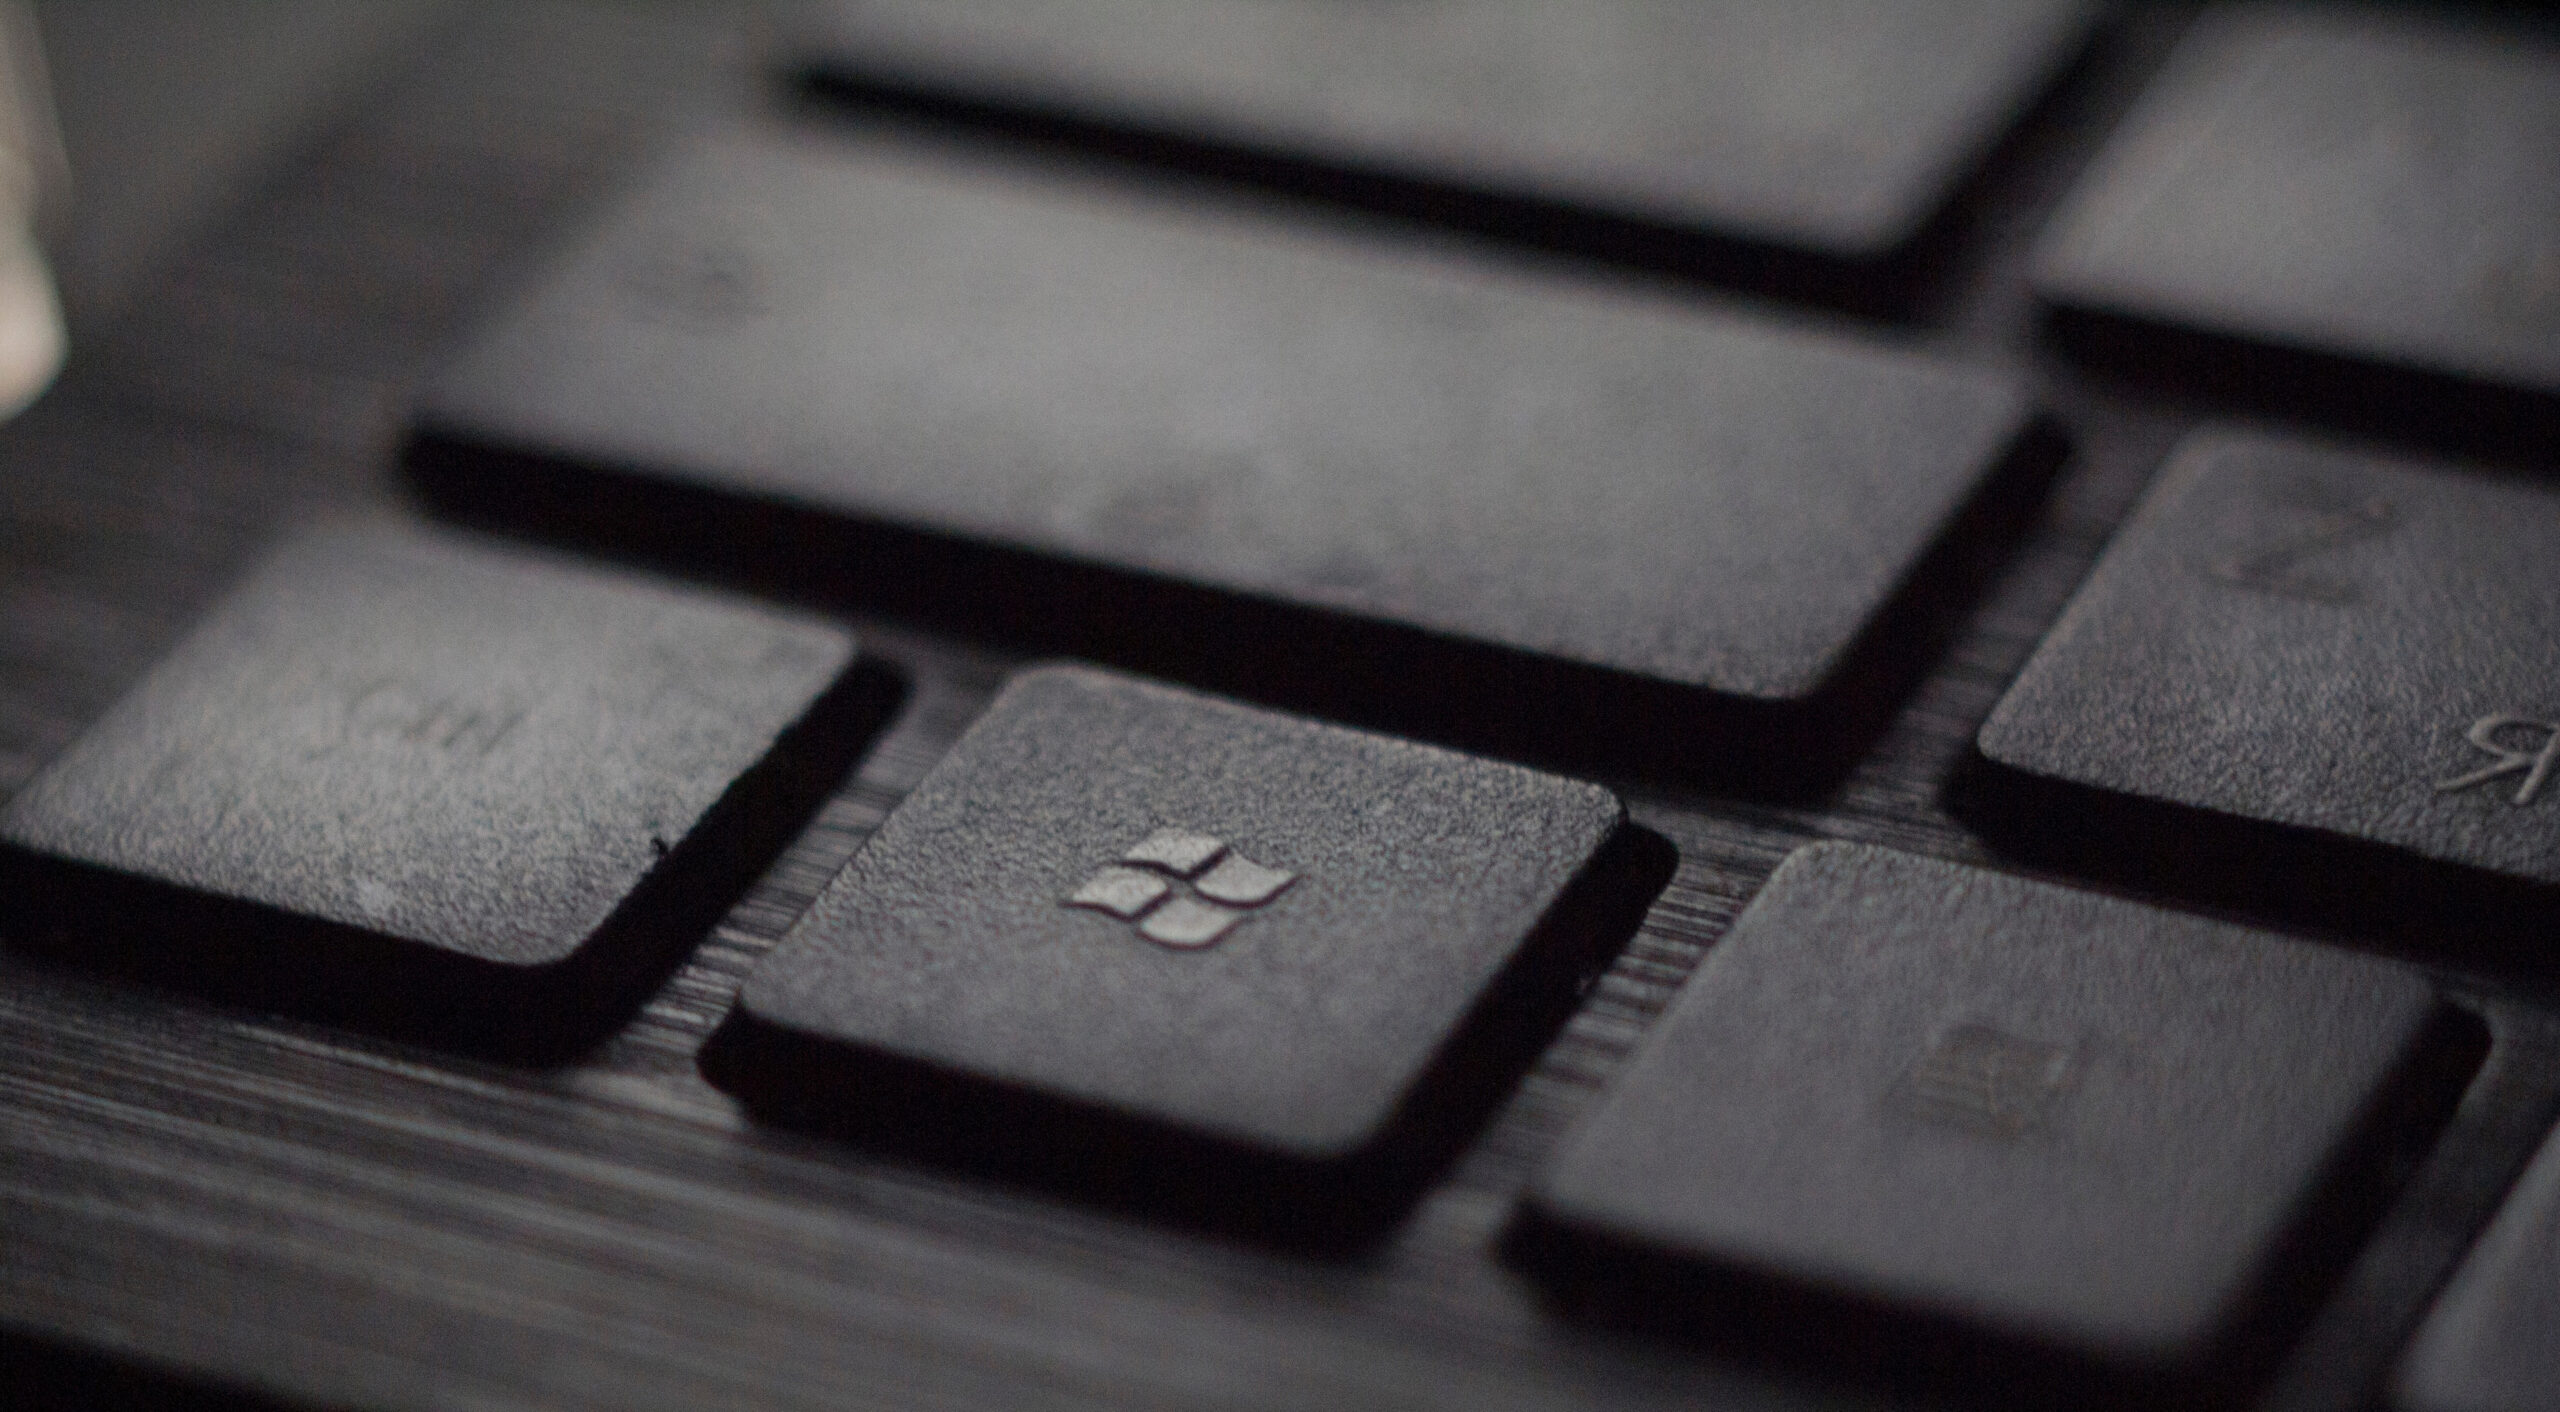 Microsoft Exchange Hack